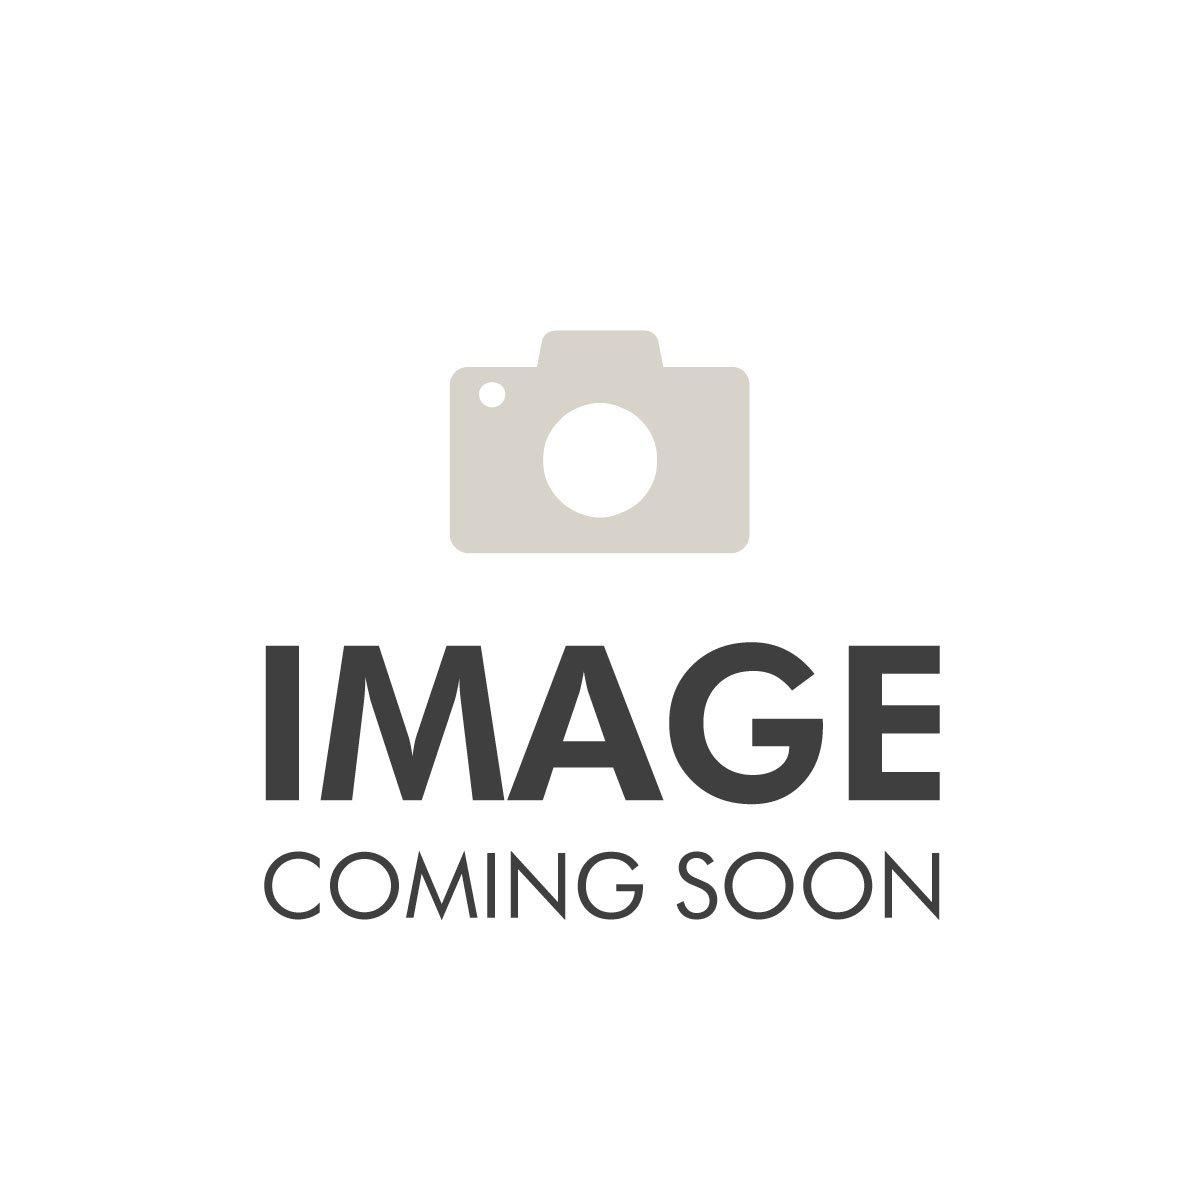 Mayfair Black Label 100ml EDT Spray